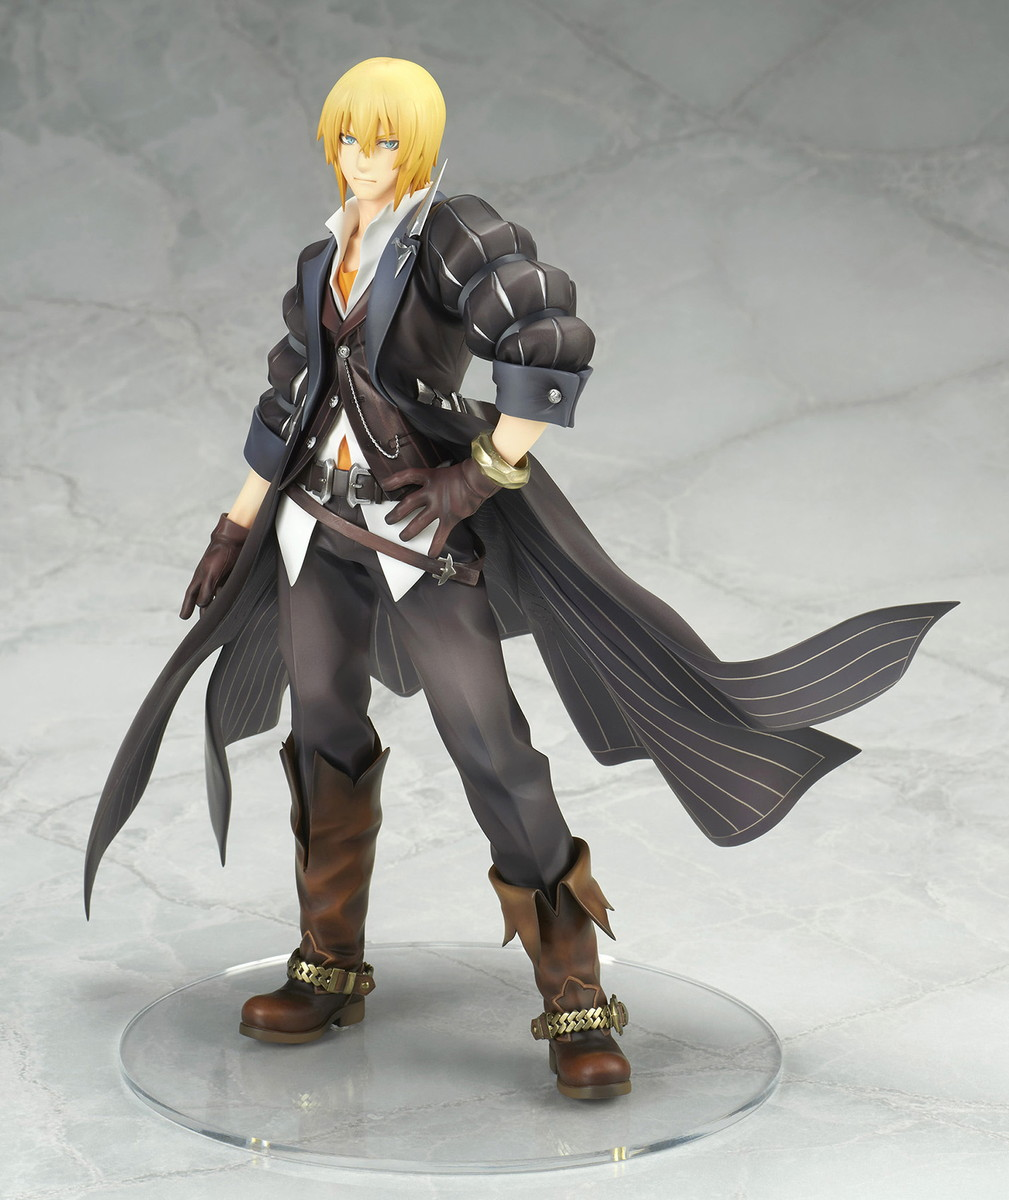 Eizen Tales of Berseria Figure 4560228204827